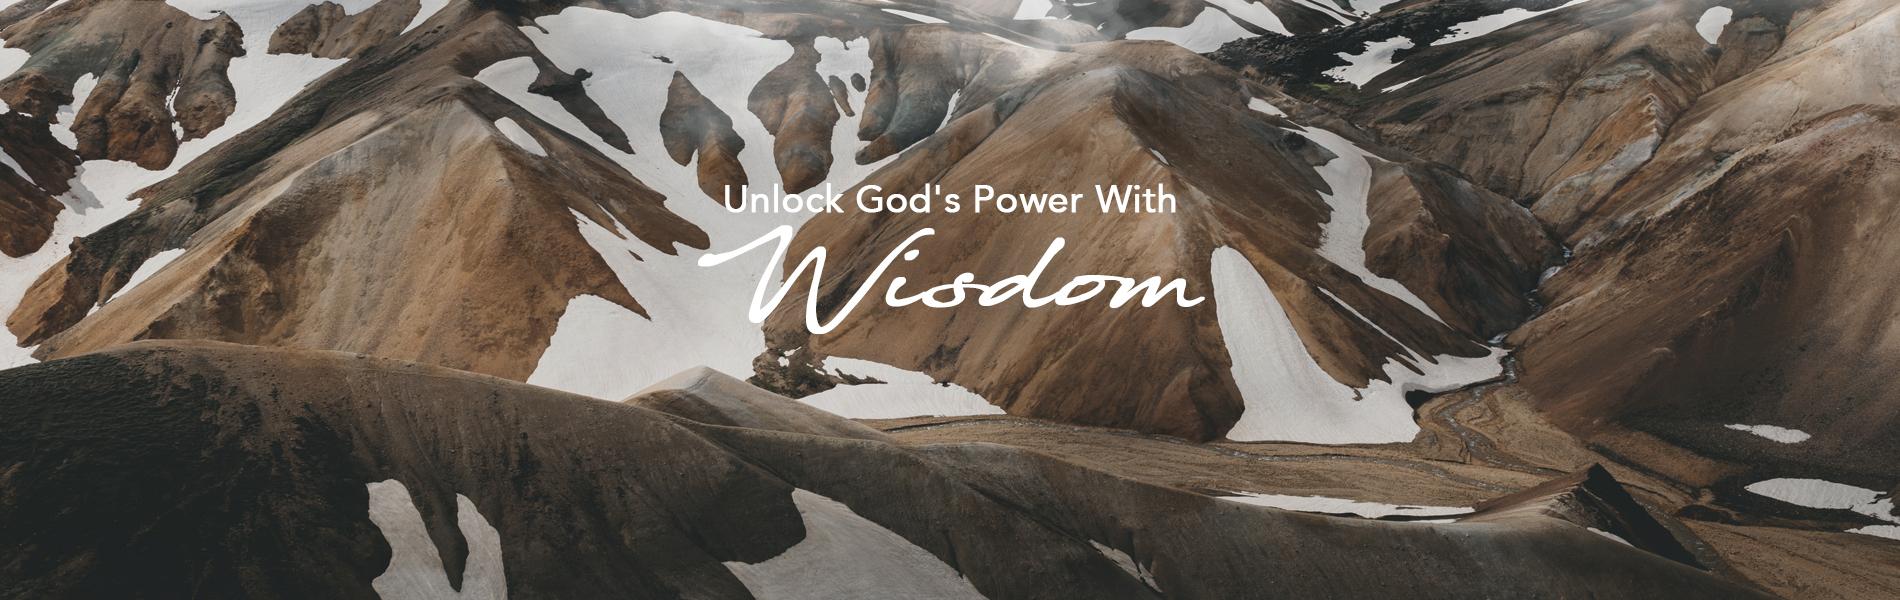 2019_08_Aug_Unlock_Gods_Wisdom_EN New Creation TV | Broadcasting the Gospel of Jesus